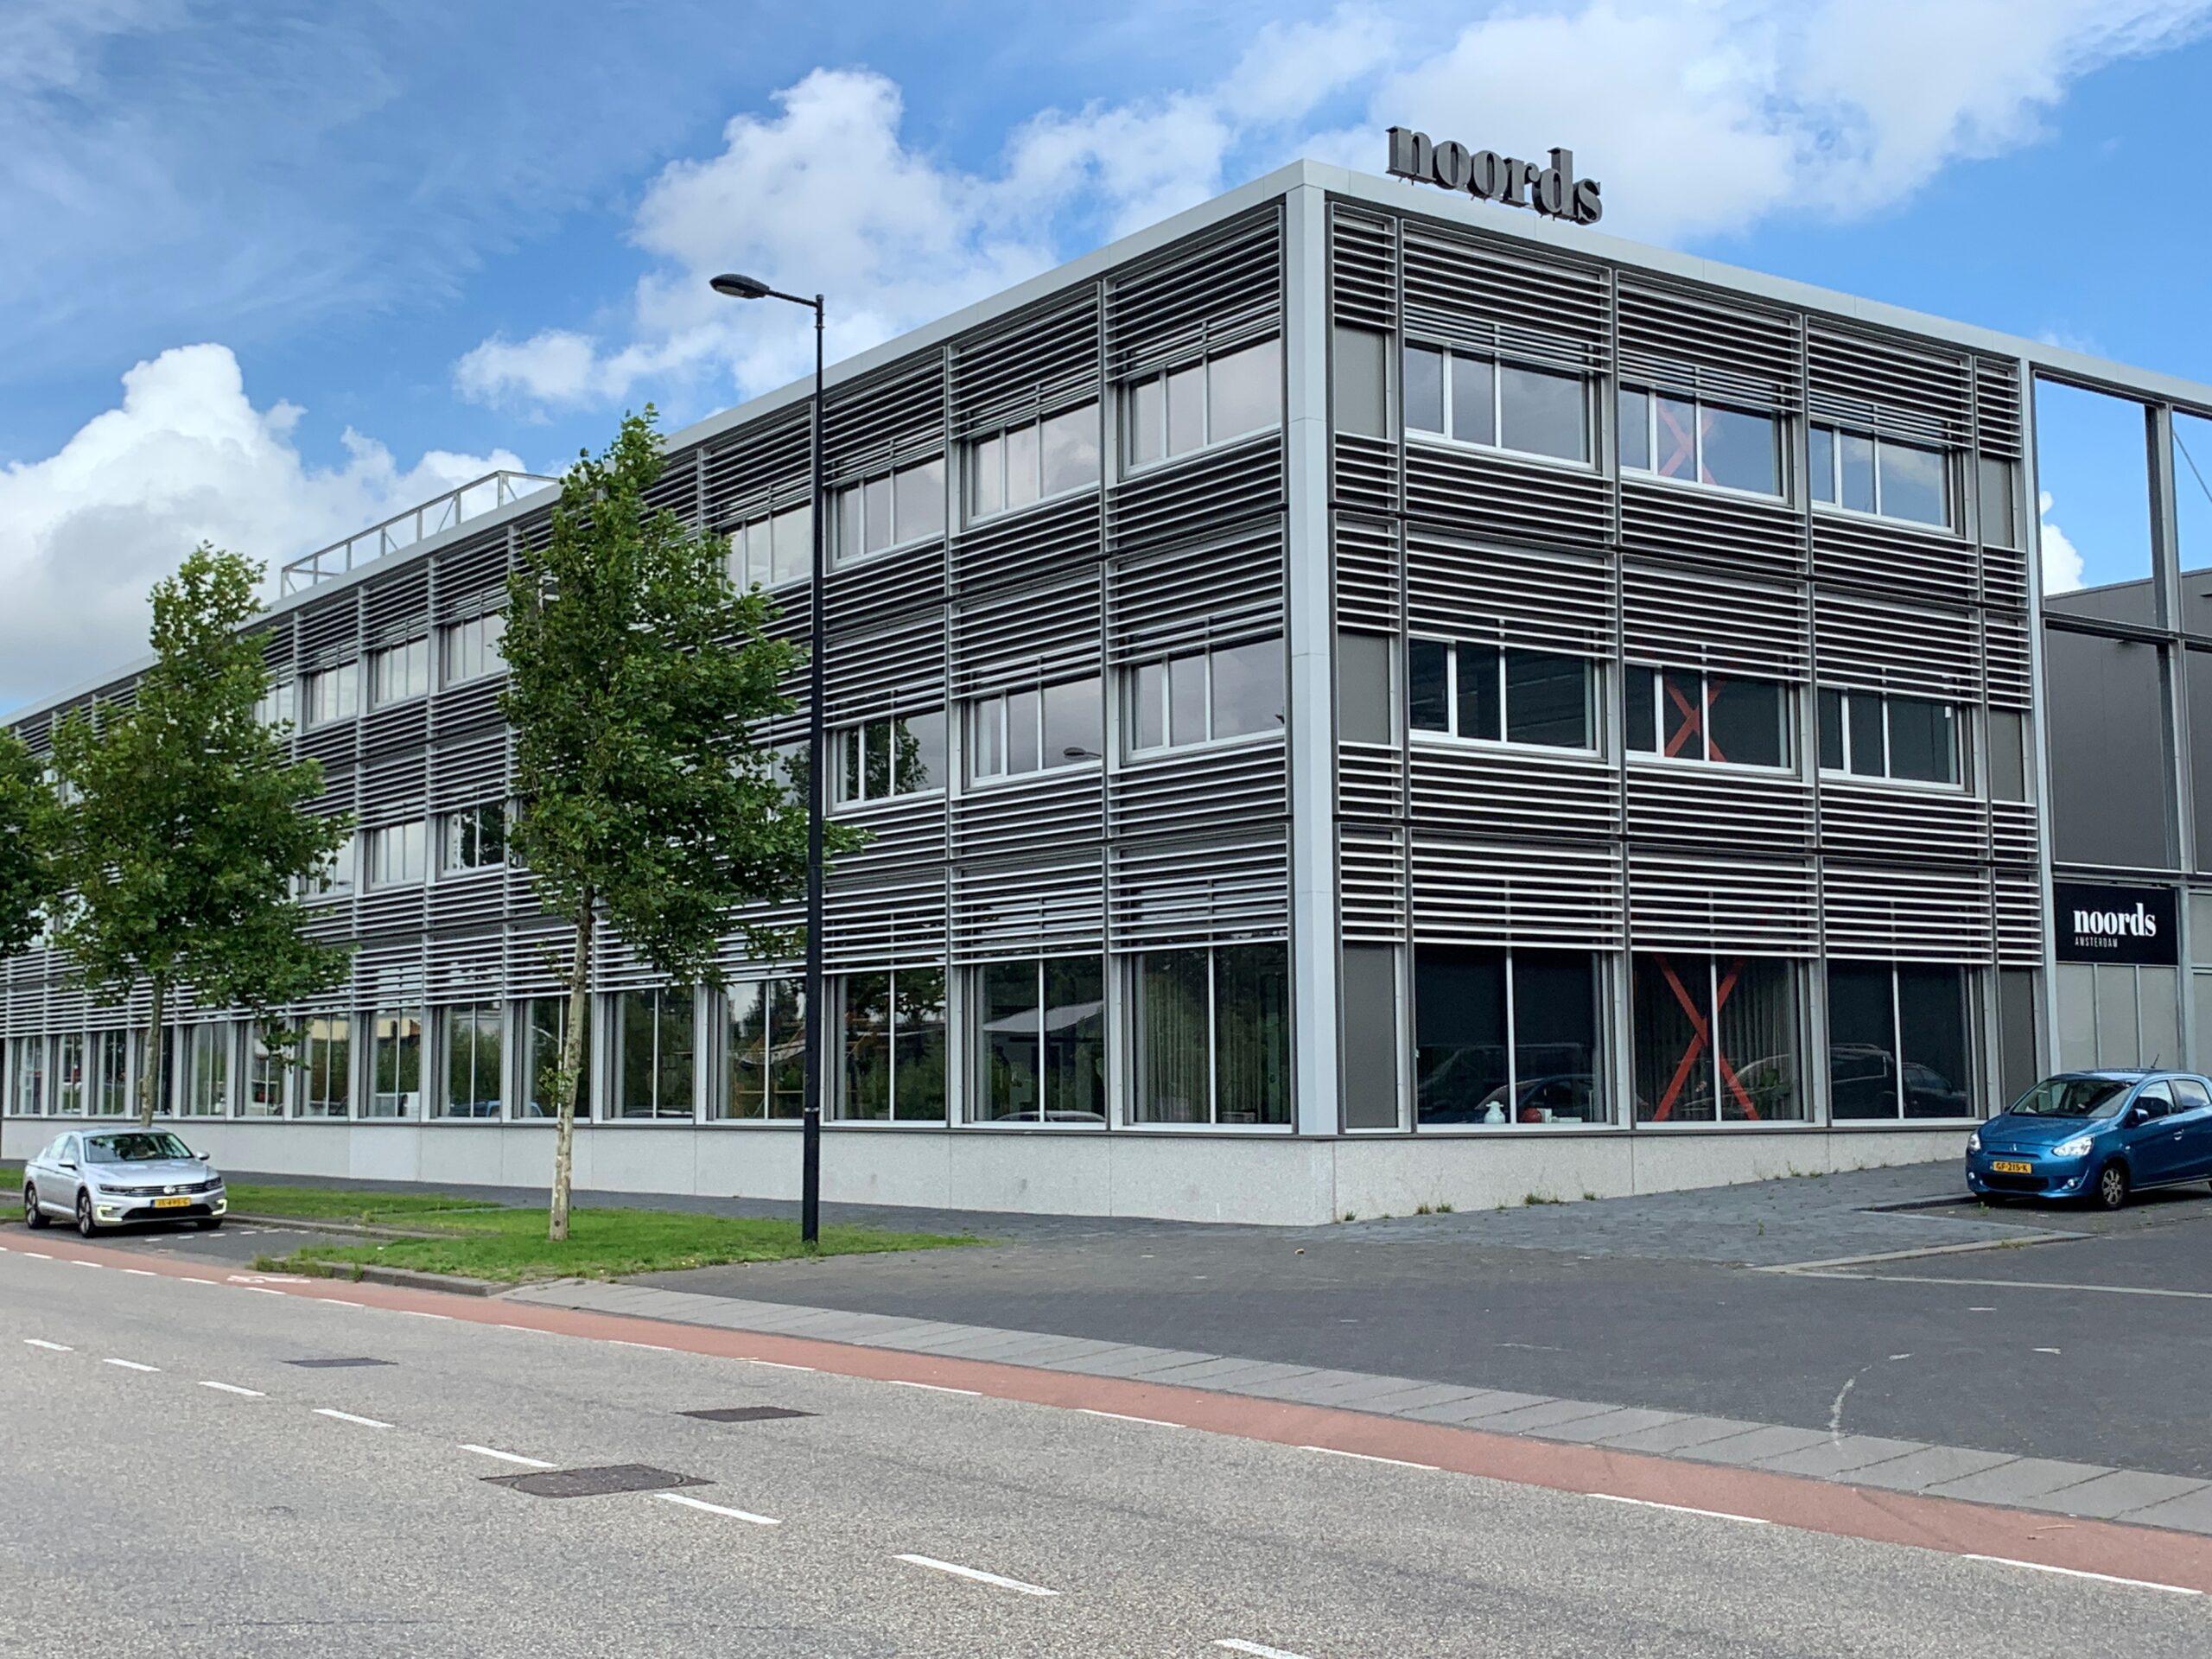 gebouw noords amsterdam